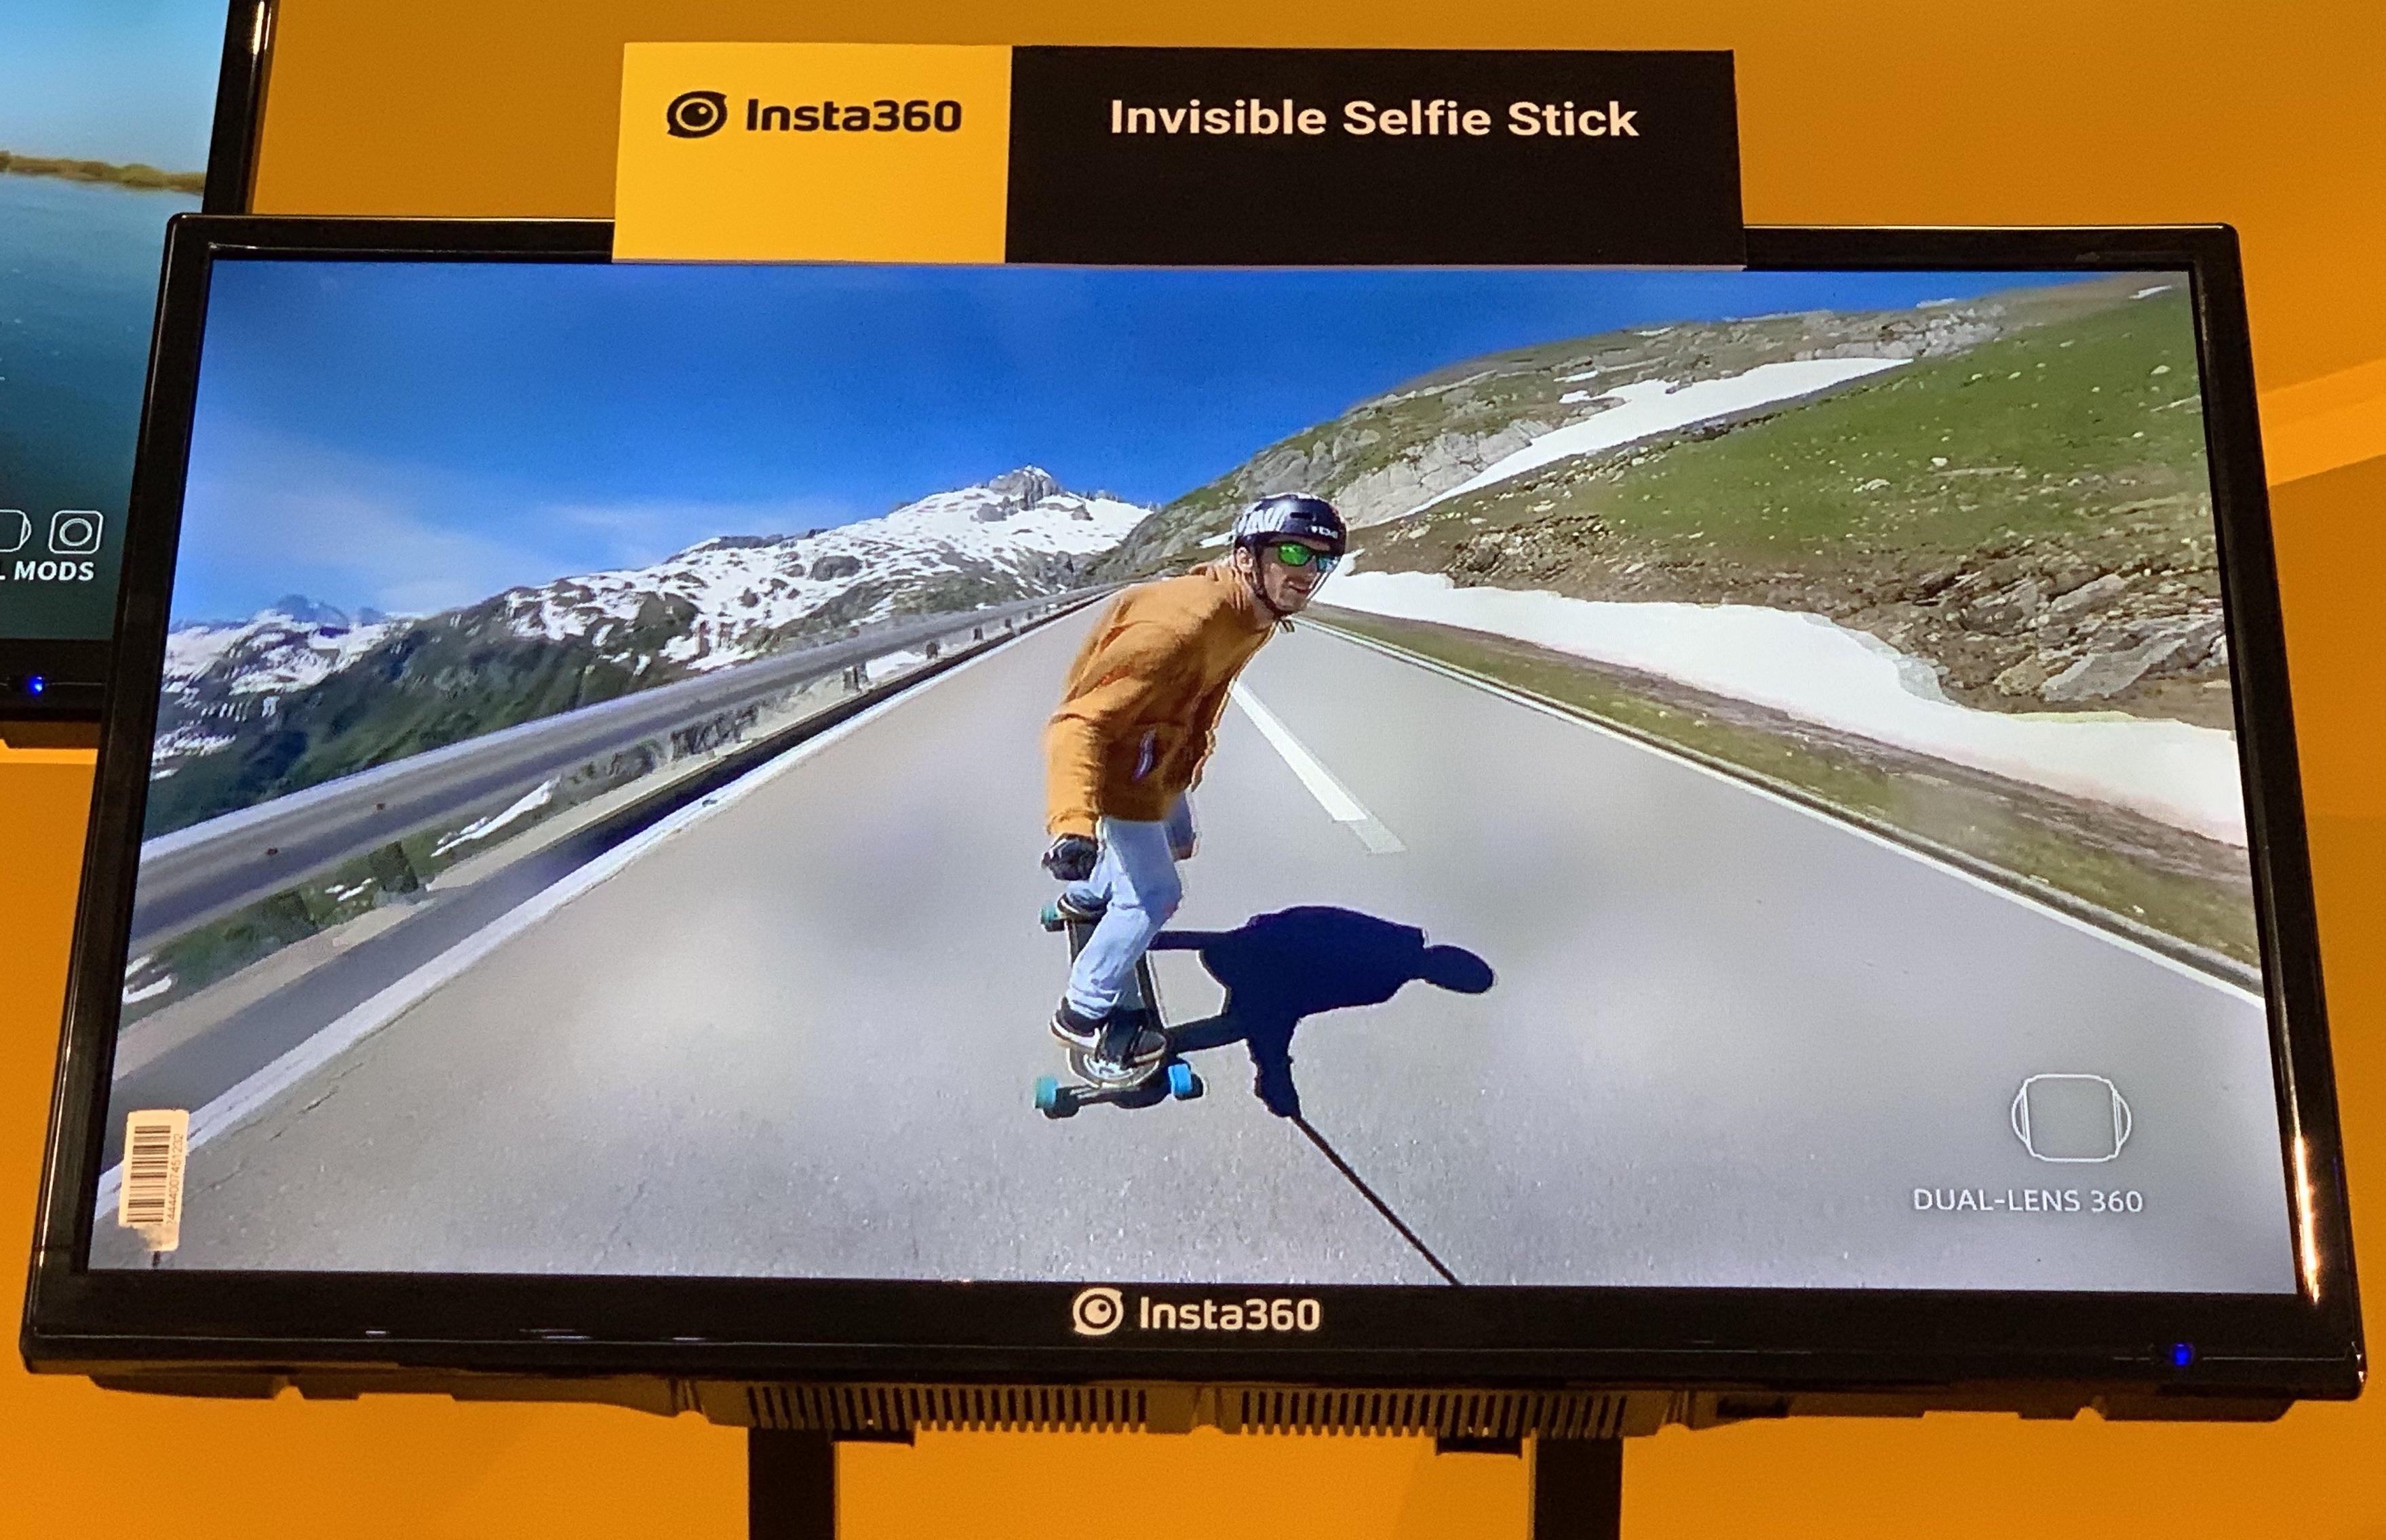 Insta 360 invisible selfie stick